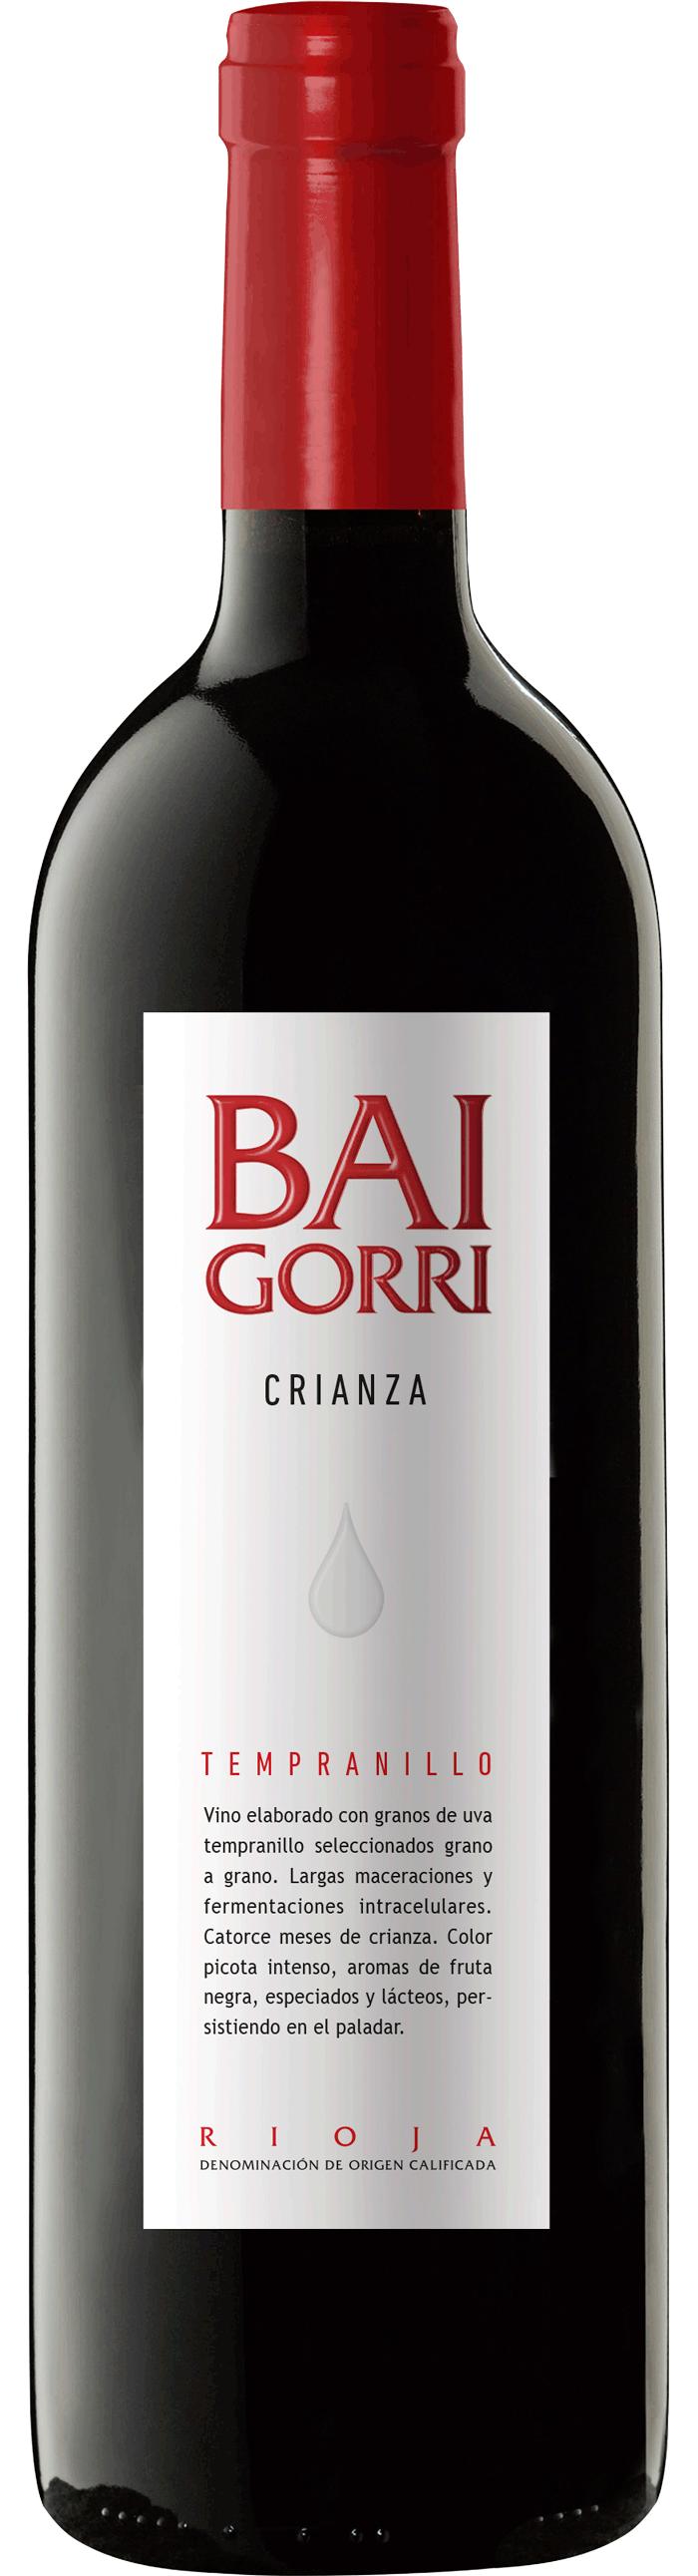 Виноград «темпранильо» — хорошая основа для вина